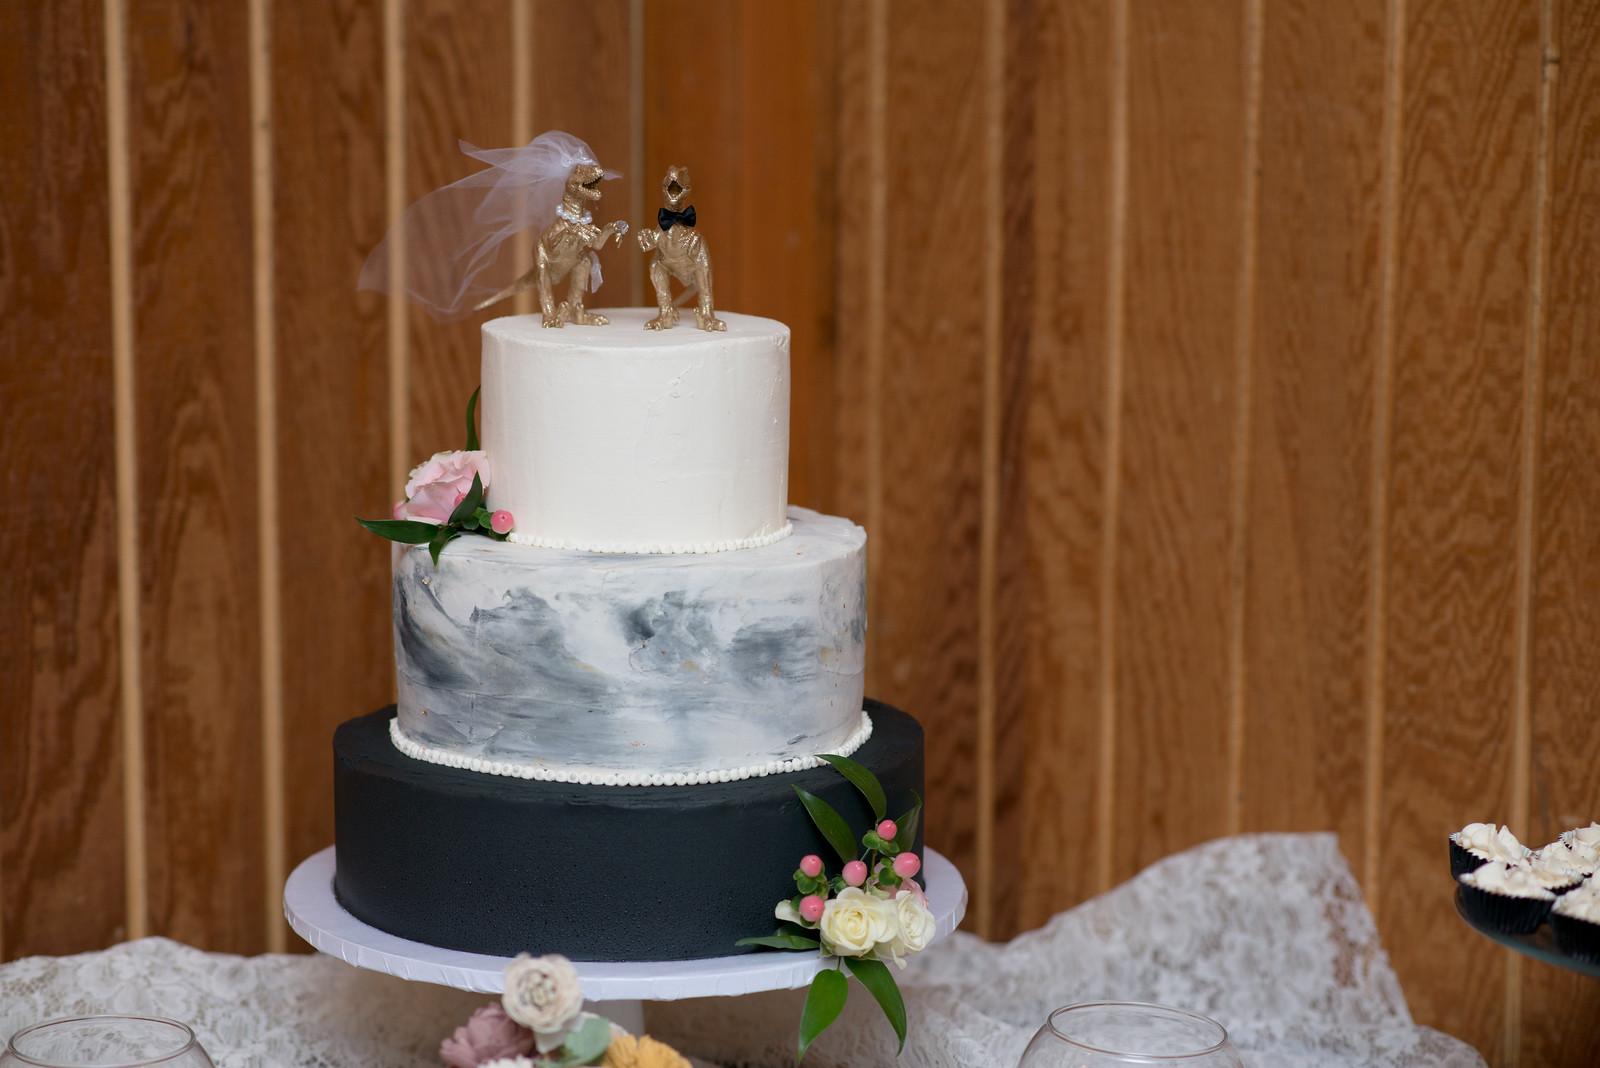 Black and White Wedding Cake.jpg